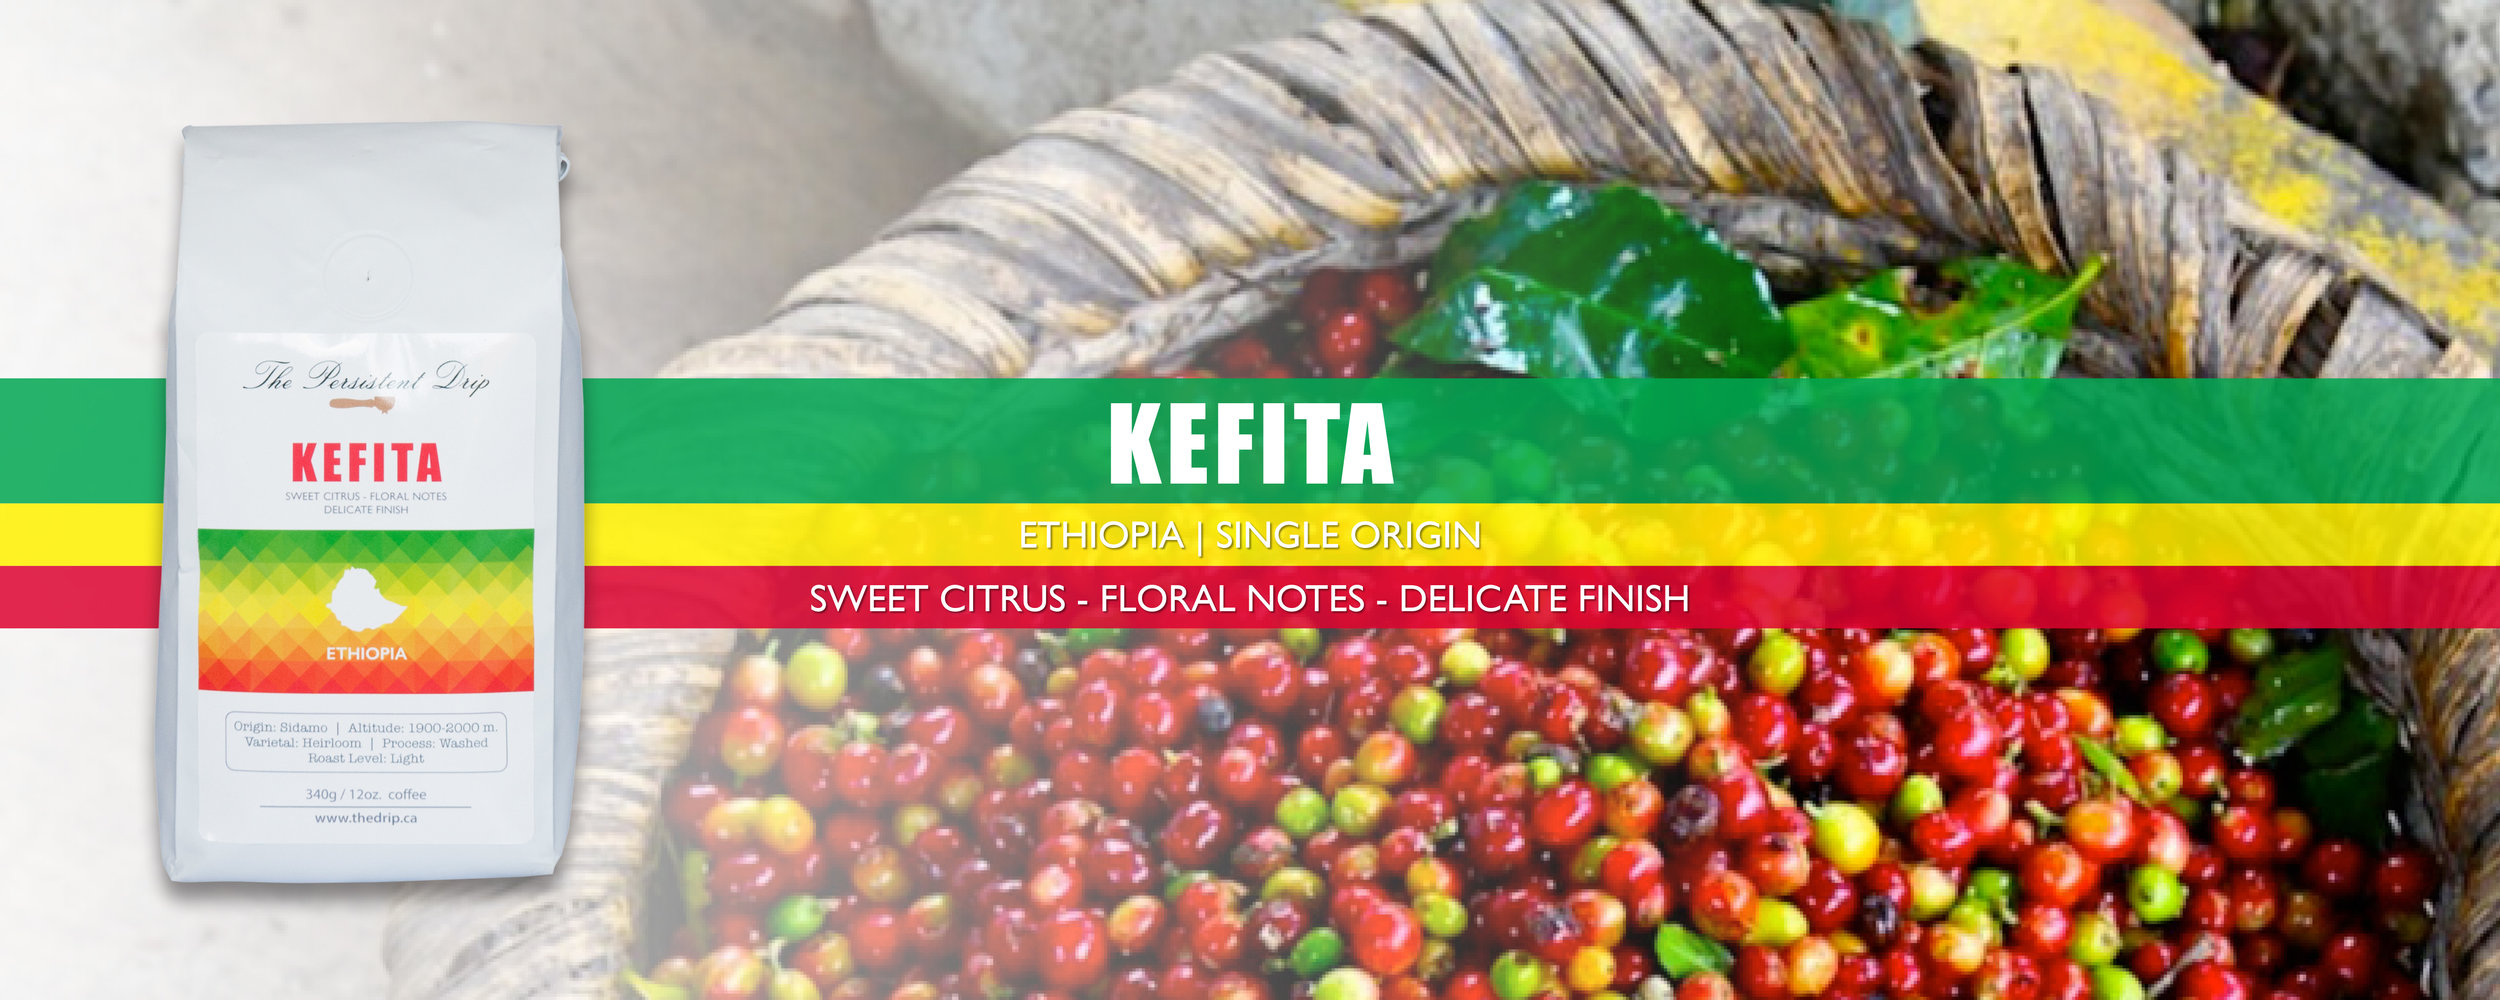 Banner-C-Kefita.jpg